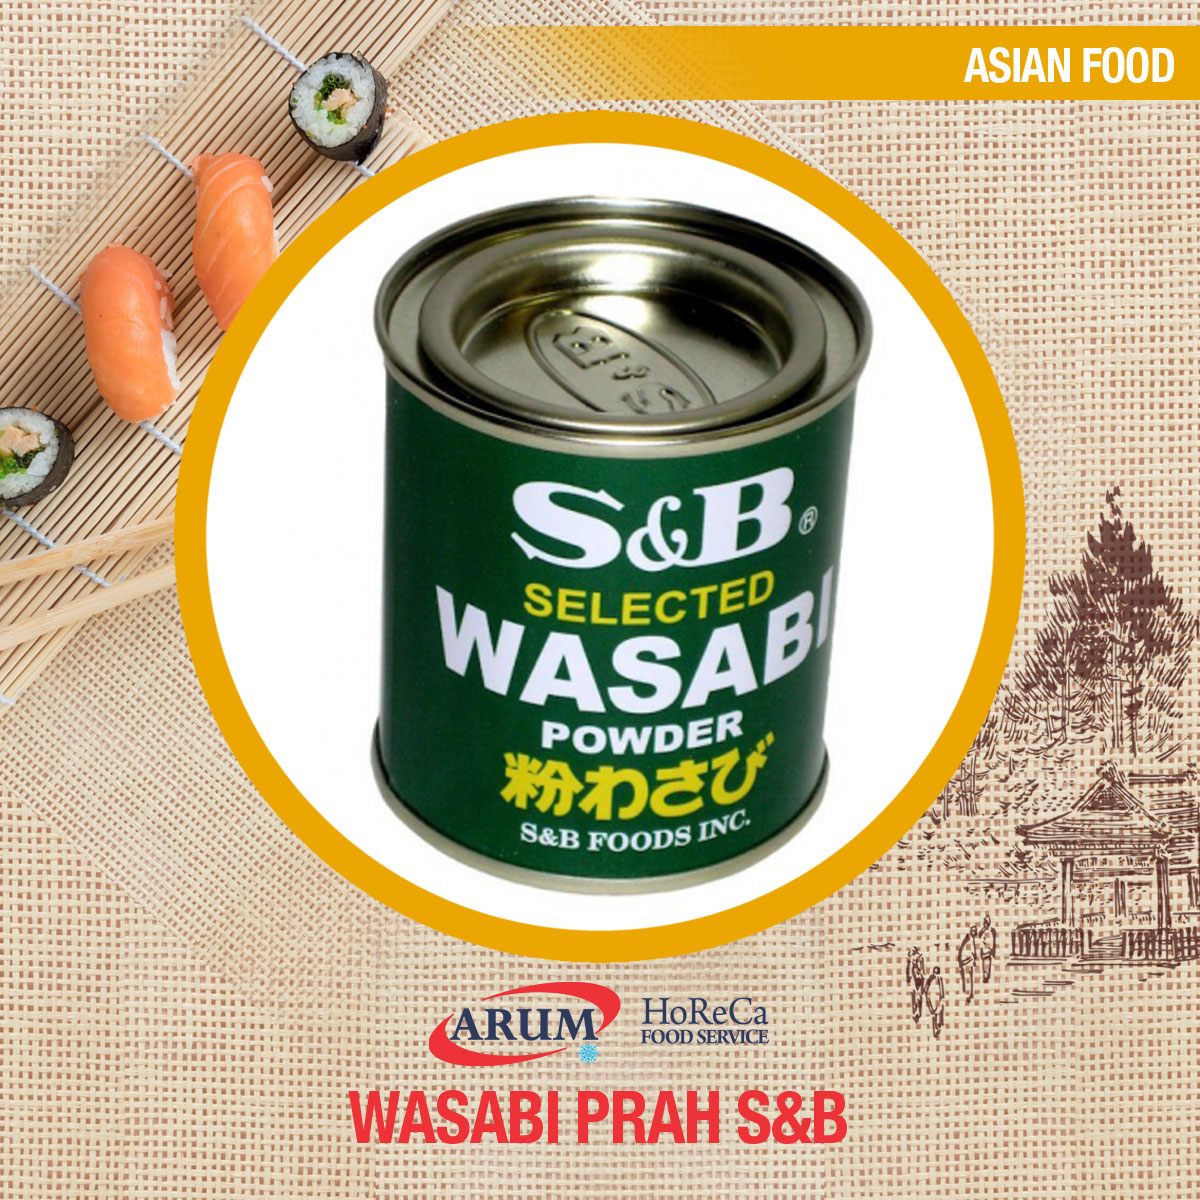 Wasabi prah 30g s&b